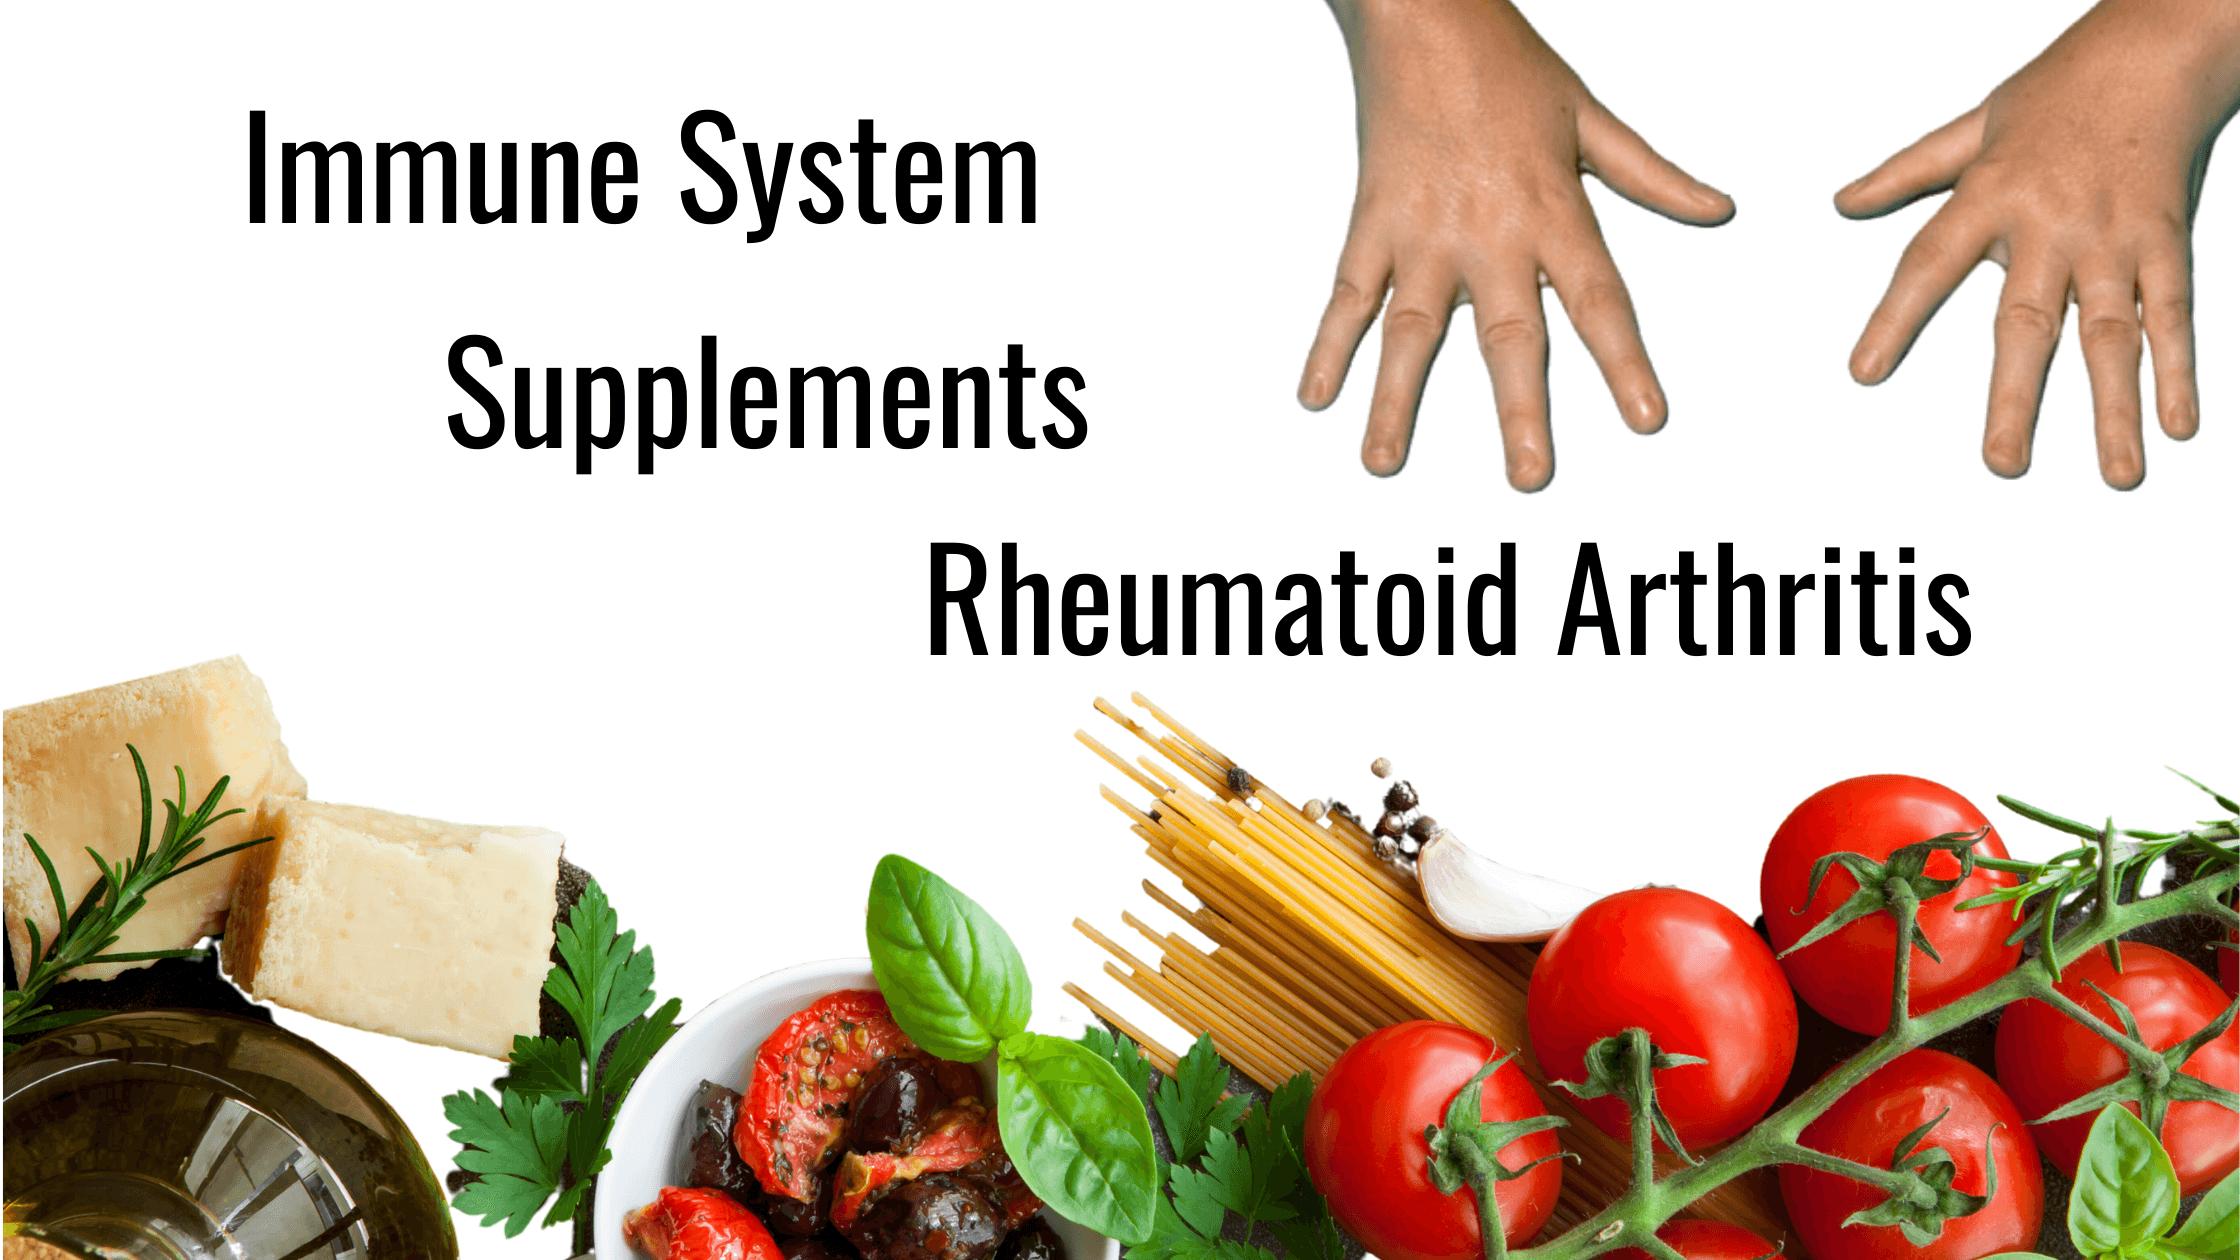 IMMUNE-SYSTEM-SUPPLEMENTS-HELP-WITH-RHEUMATOID-ARTHRITIS